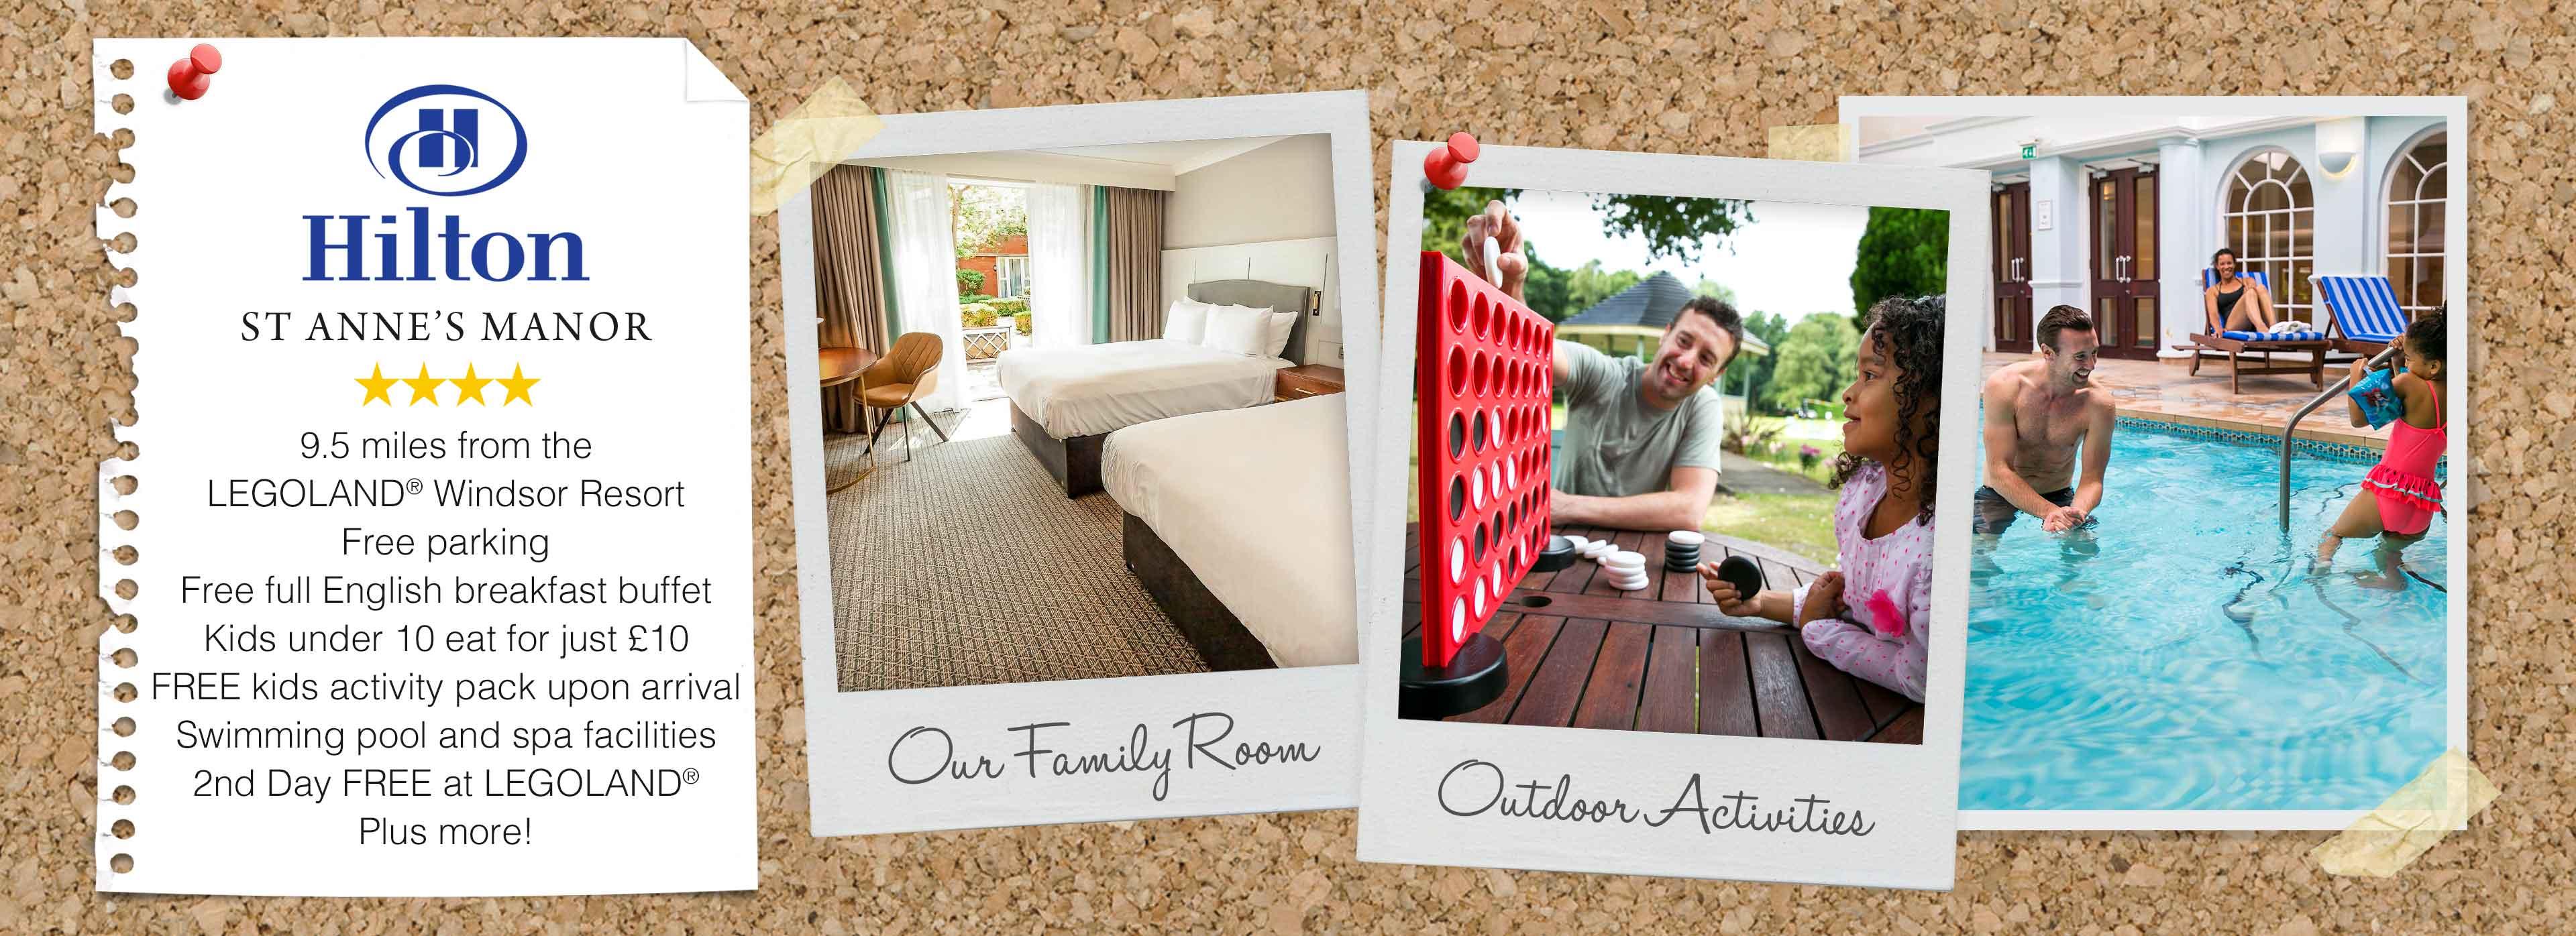 Hilton St Annes Manor Hotel